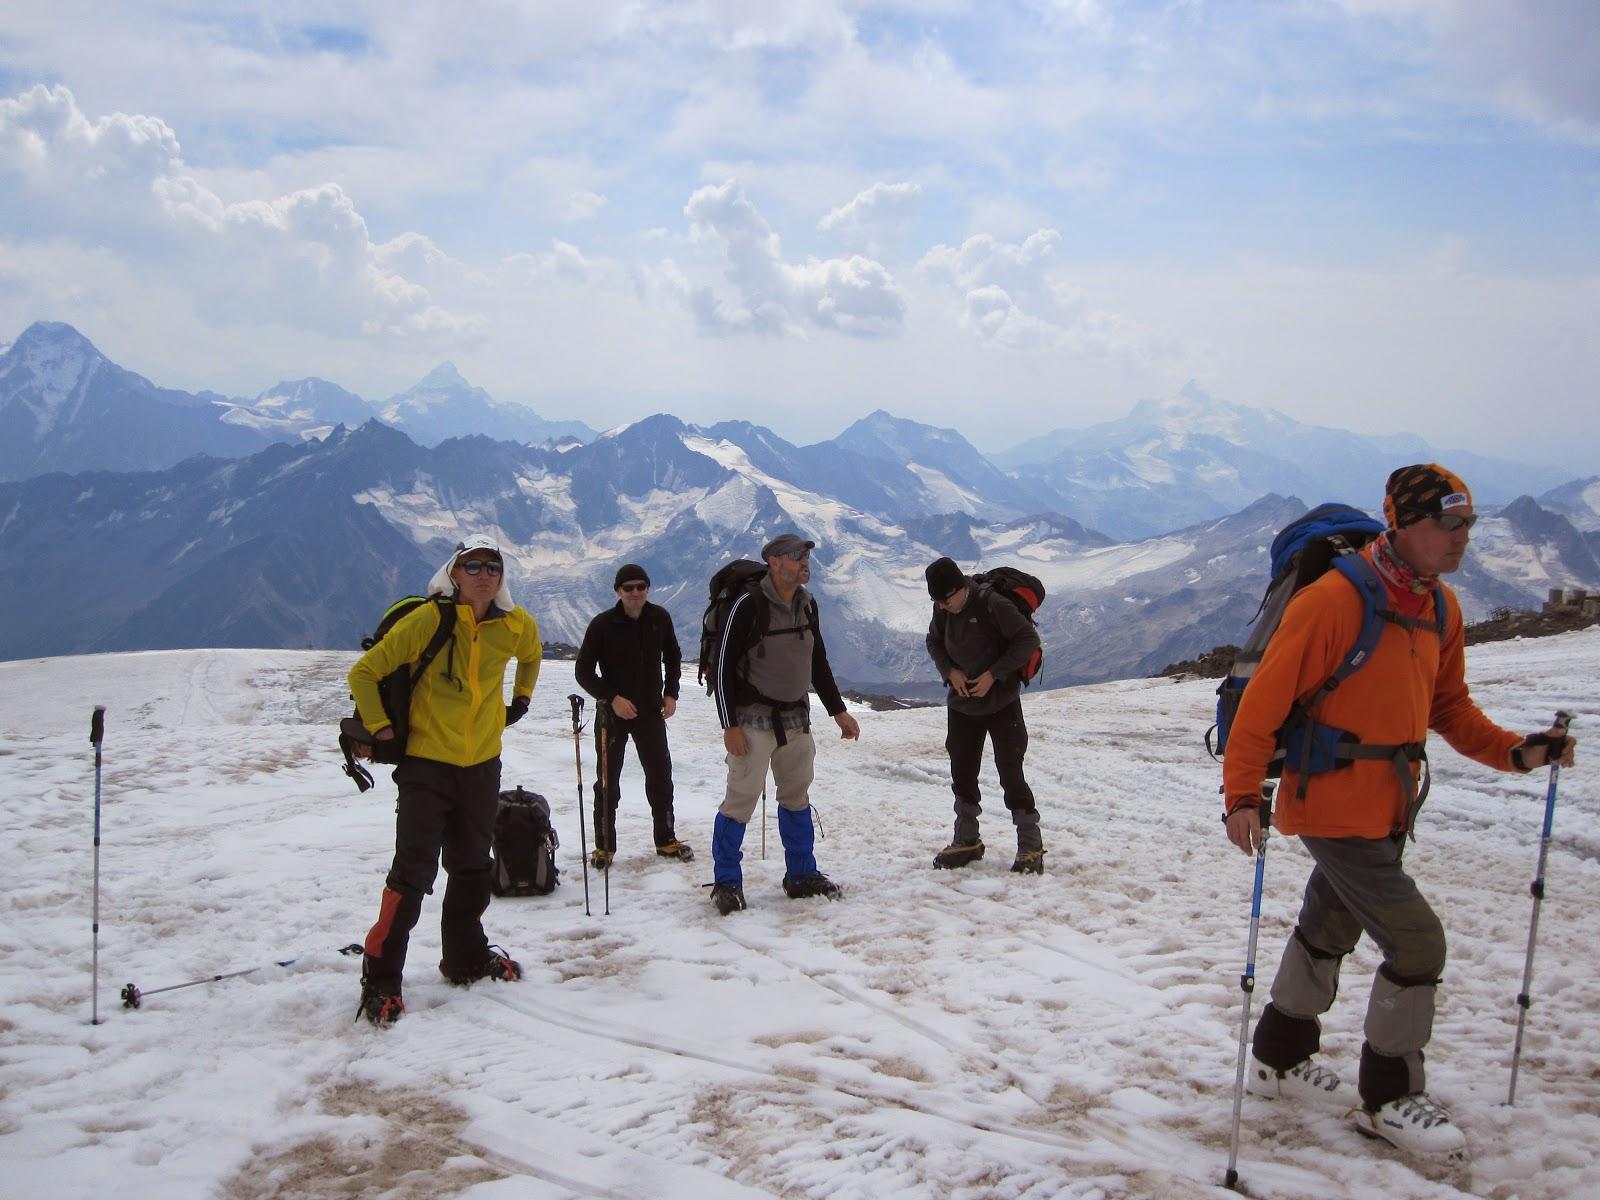 Acclimating on Mount Elbrus